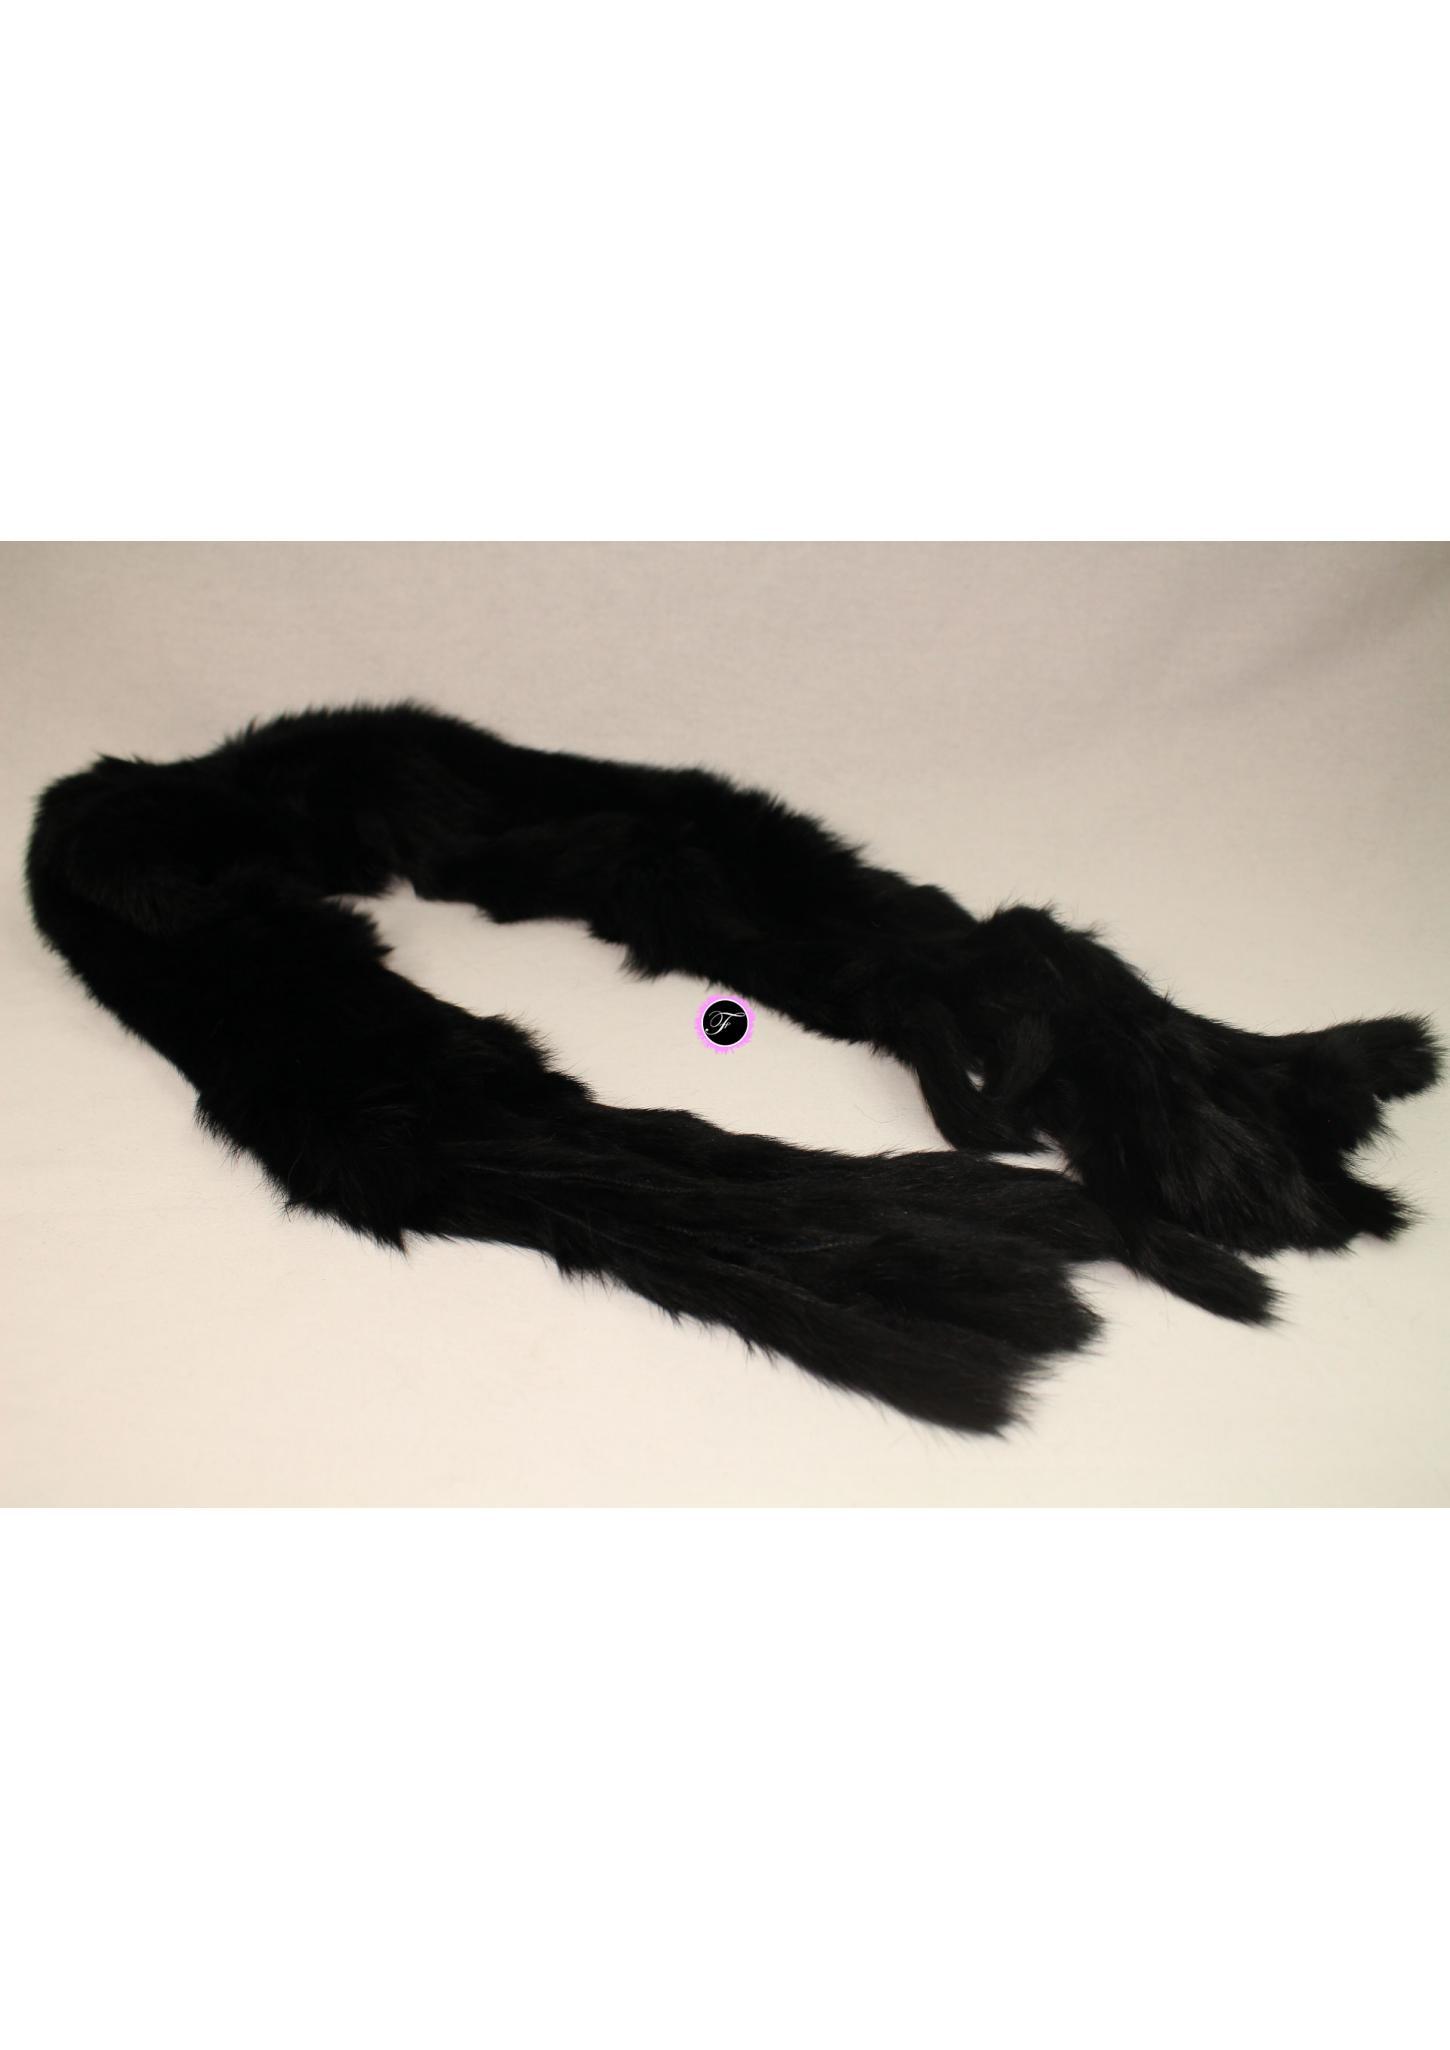 37408f84da9 Echarpe noire Fourrure de LapinO Fourrure de Lapin